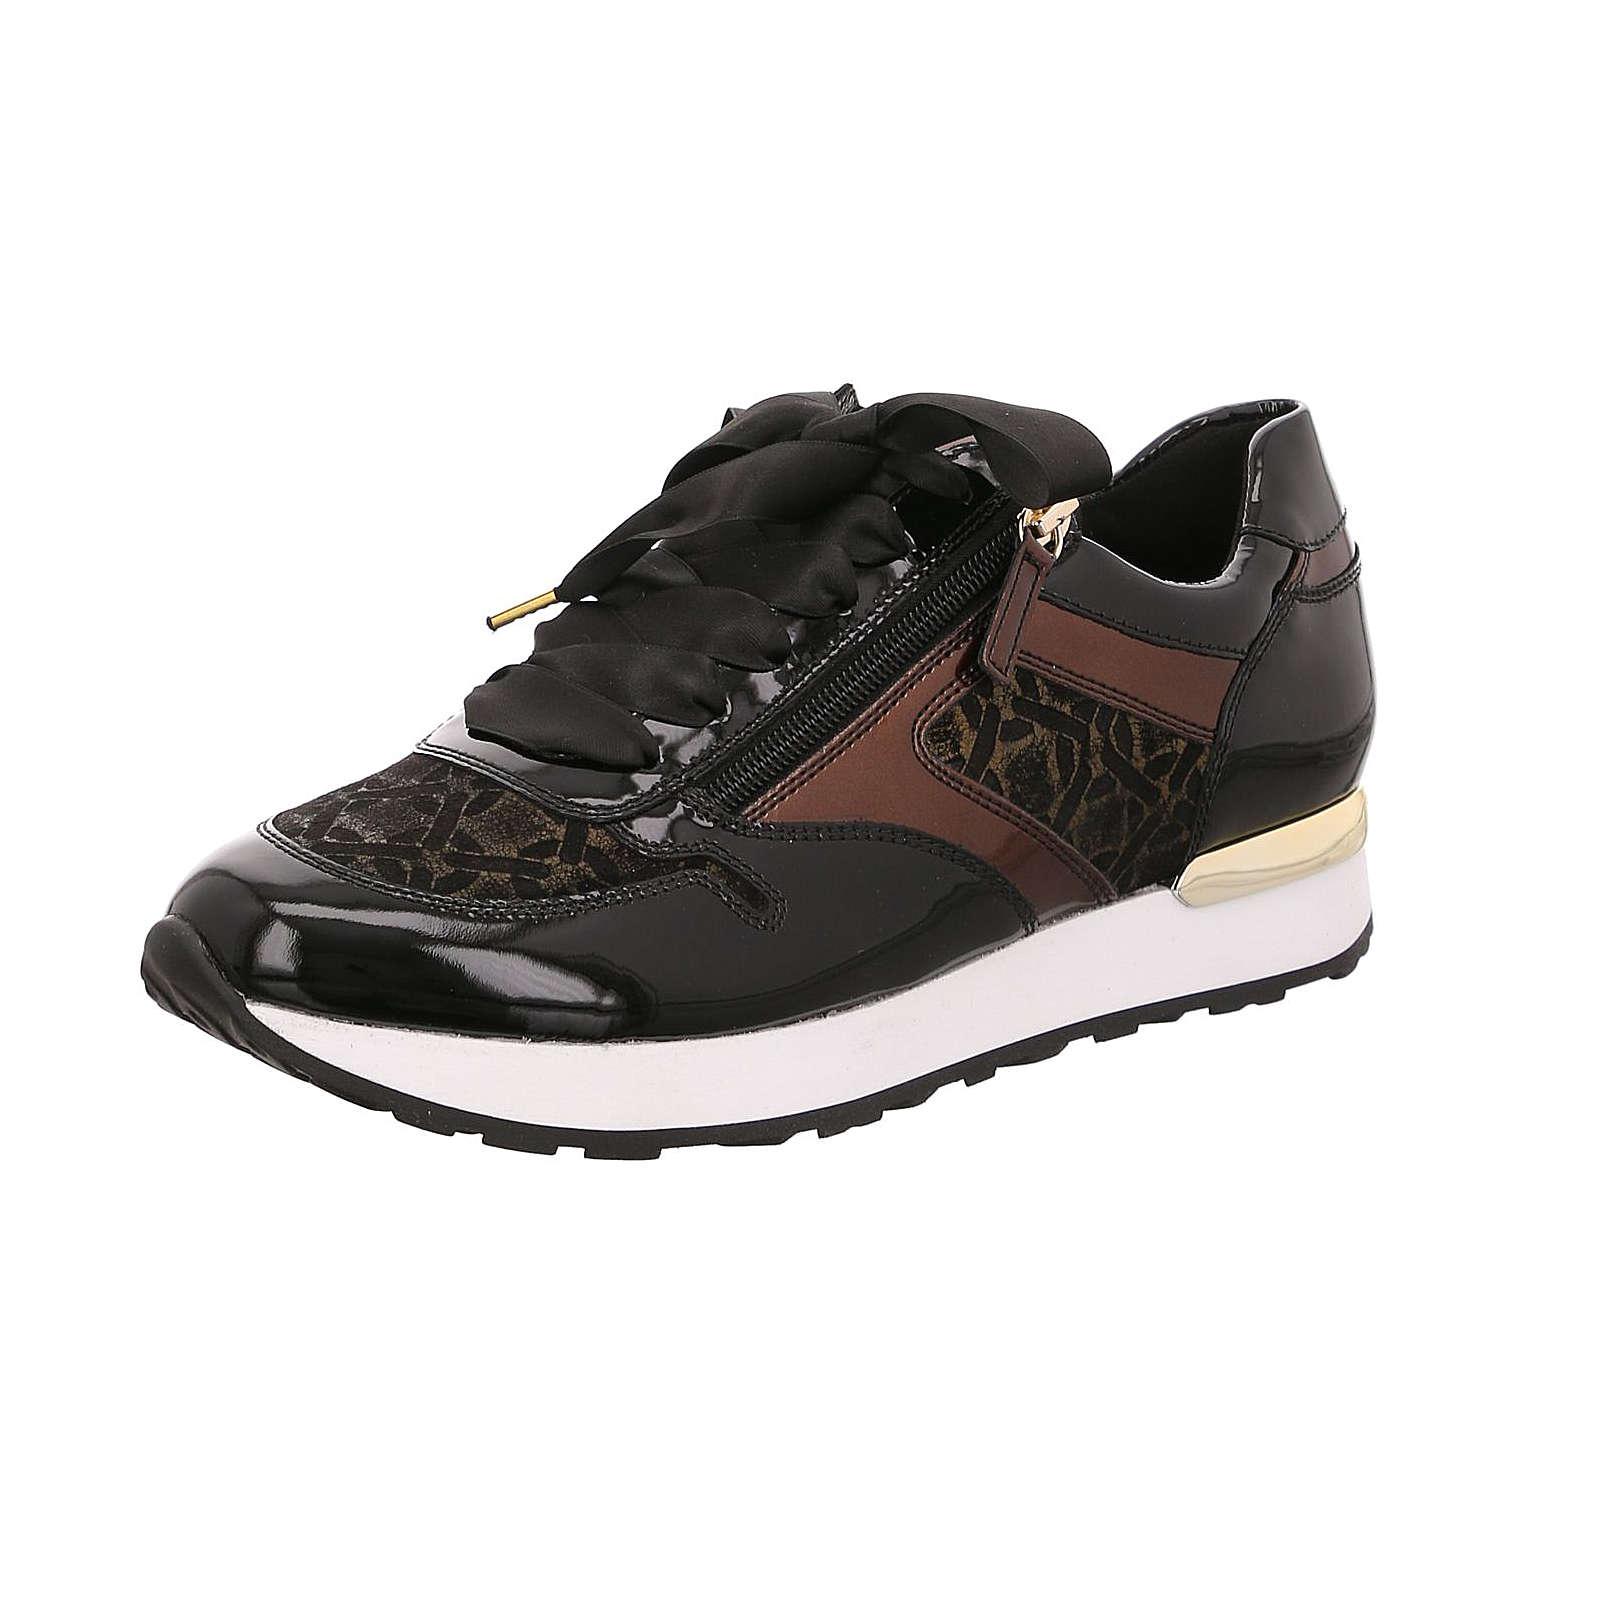 högl Sneakers Low schwarz Damen Gr. 35,5